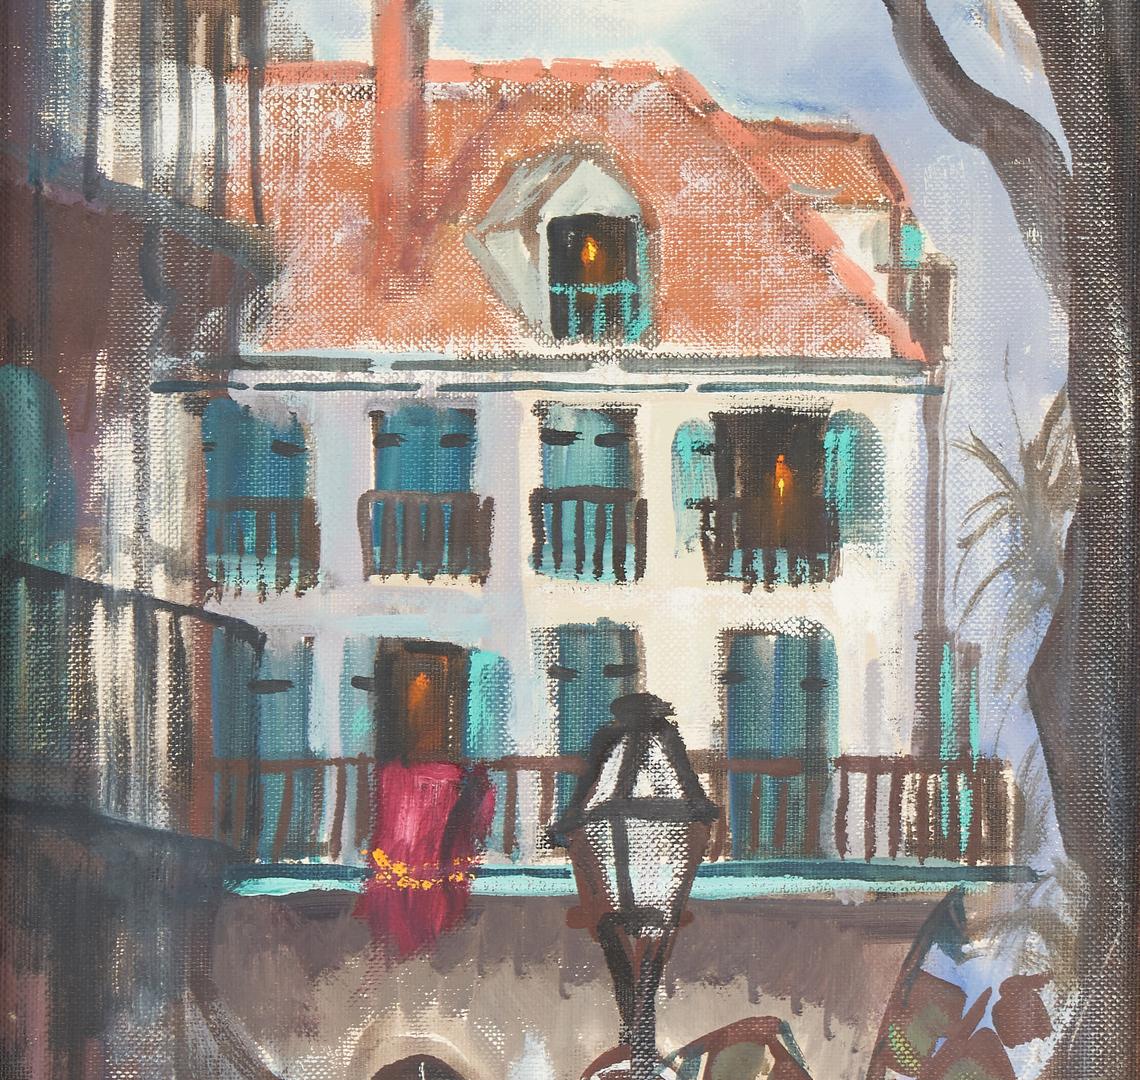 Lot 333: Pr. Oil on Board New Orleans Paintings, Heldner